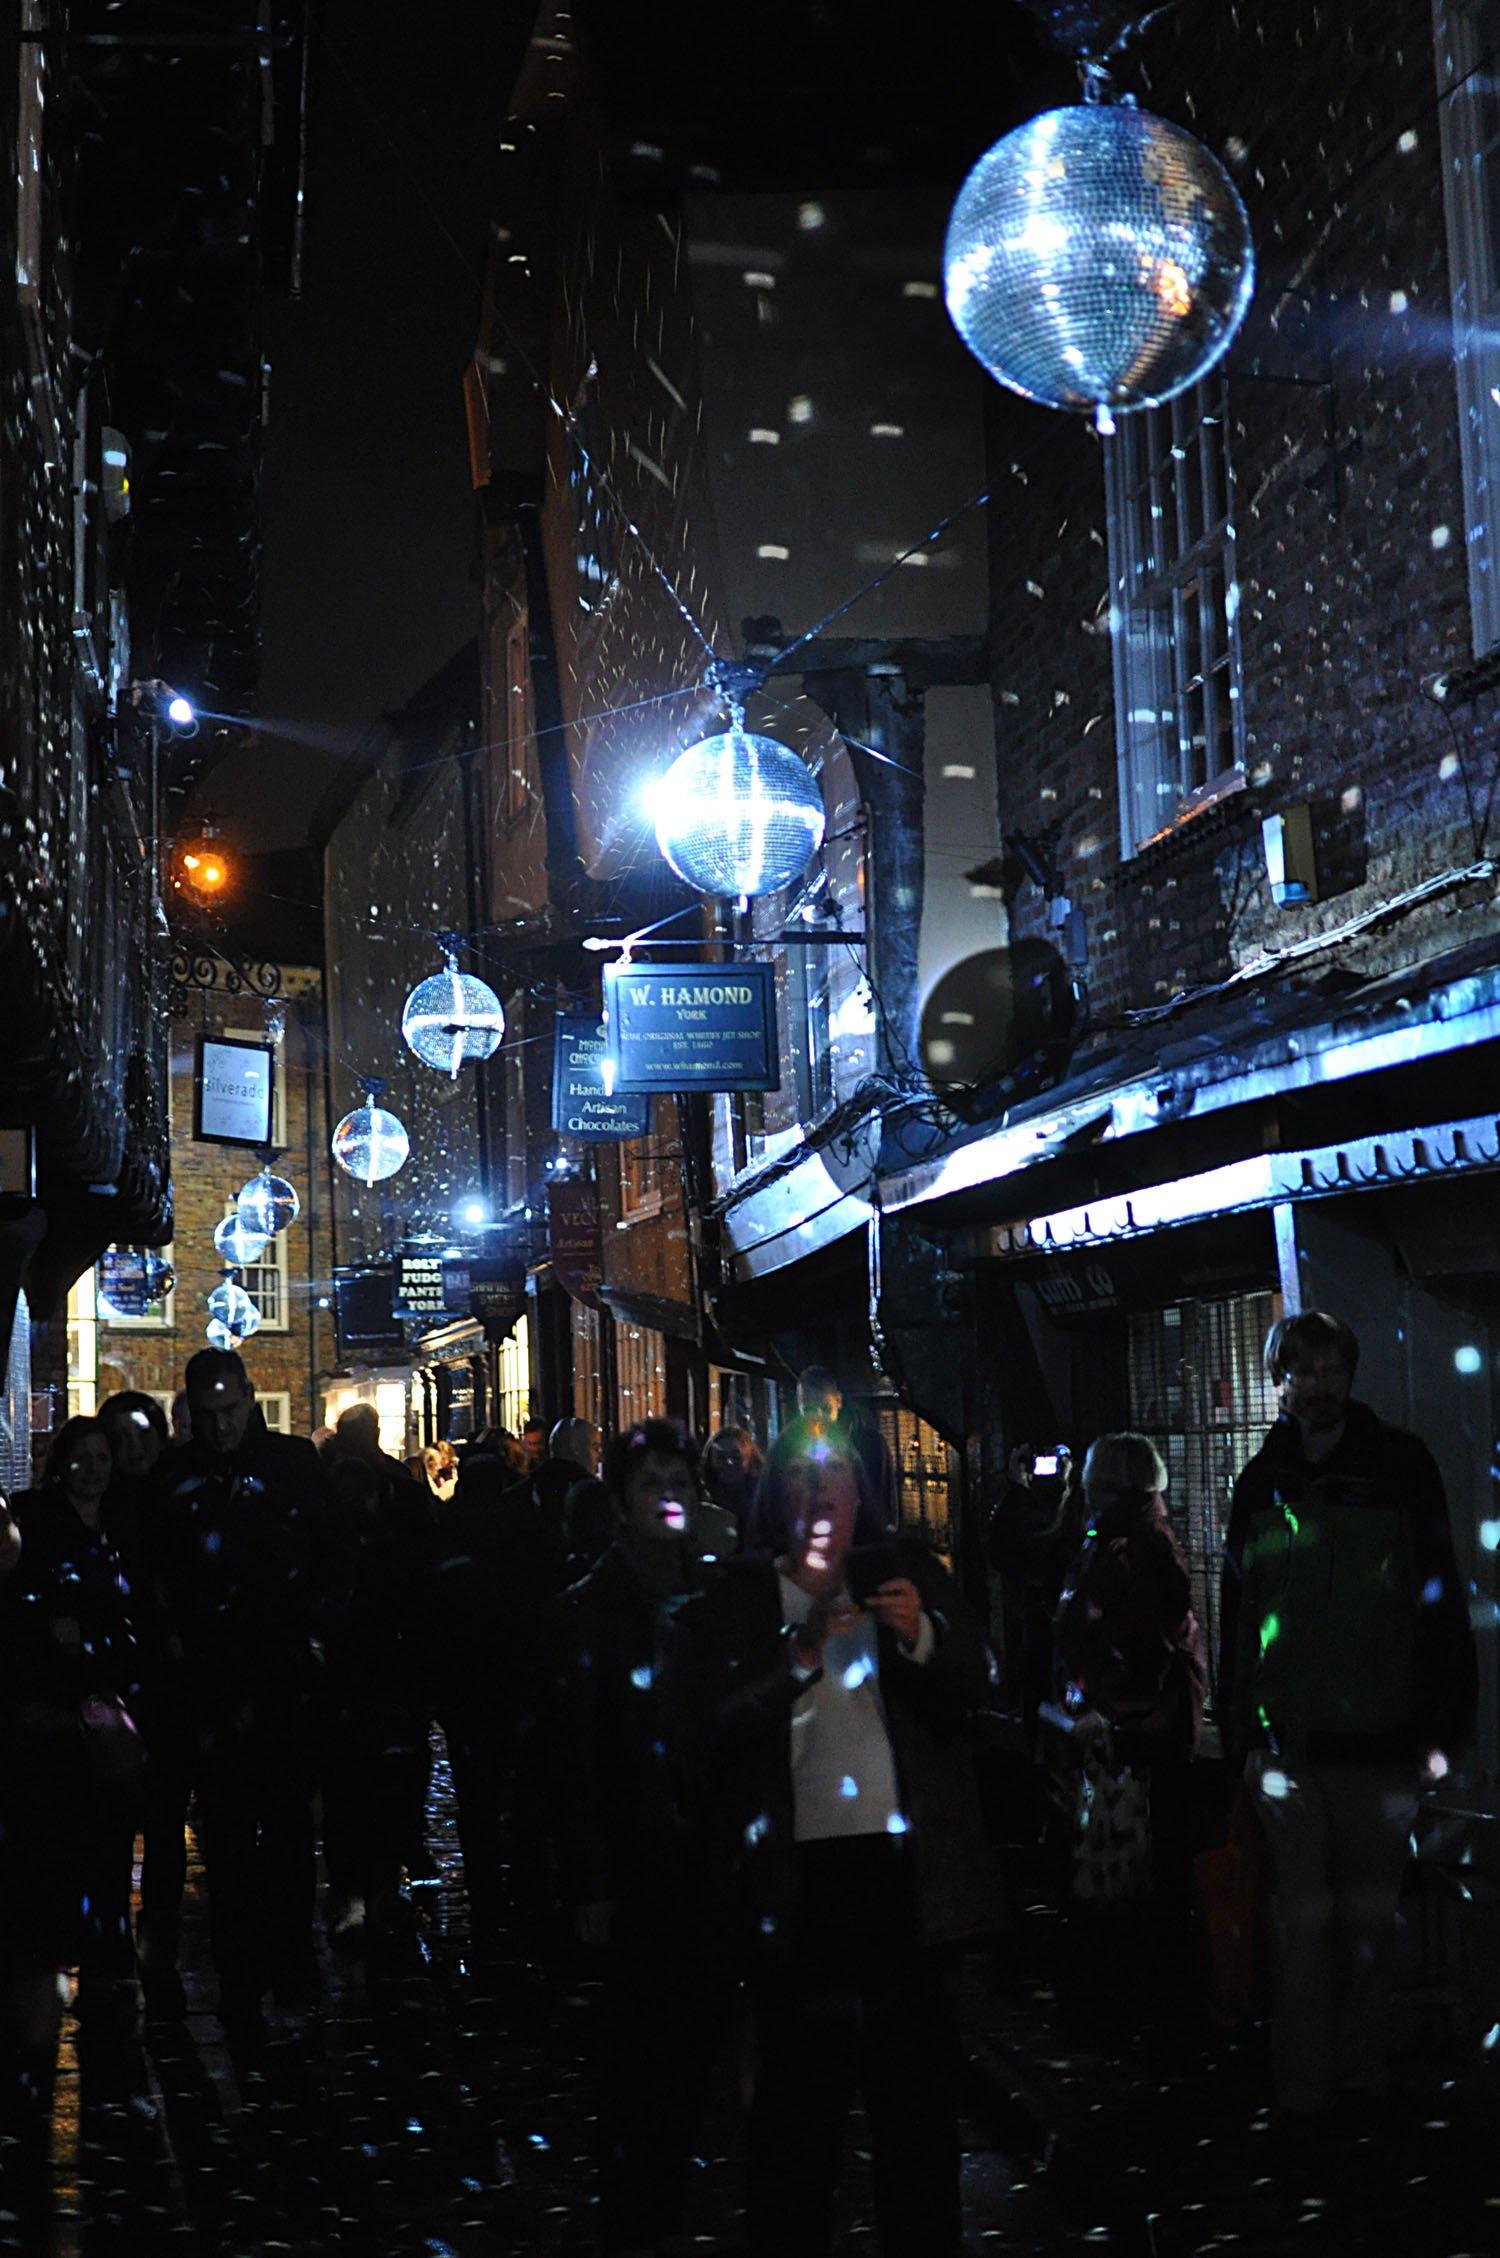 Illuminating York 2015 - The Shambles